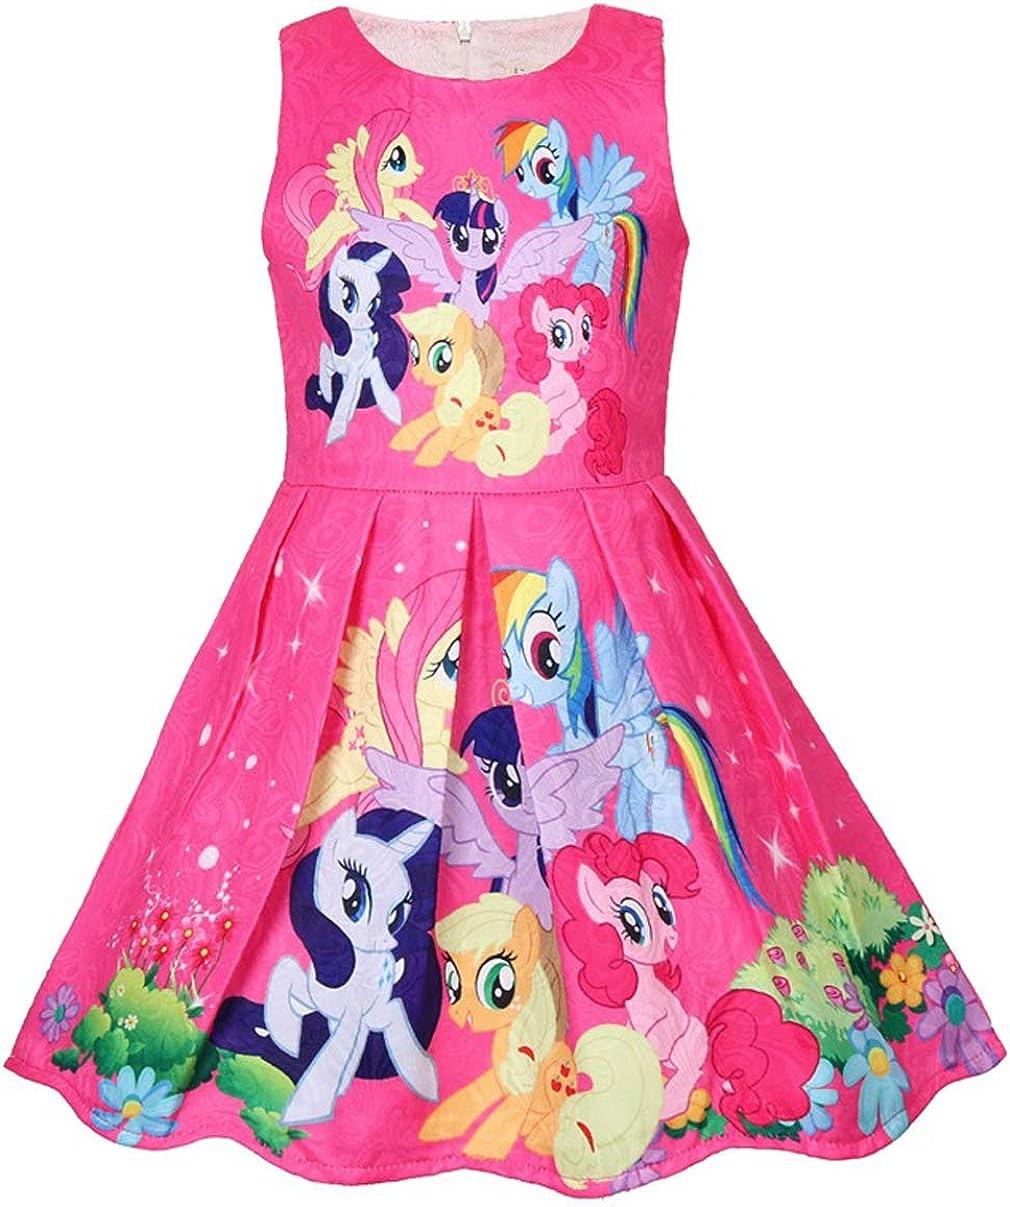 Girls Unicorn Dress Costumes Fancy Birthday Party Dress up